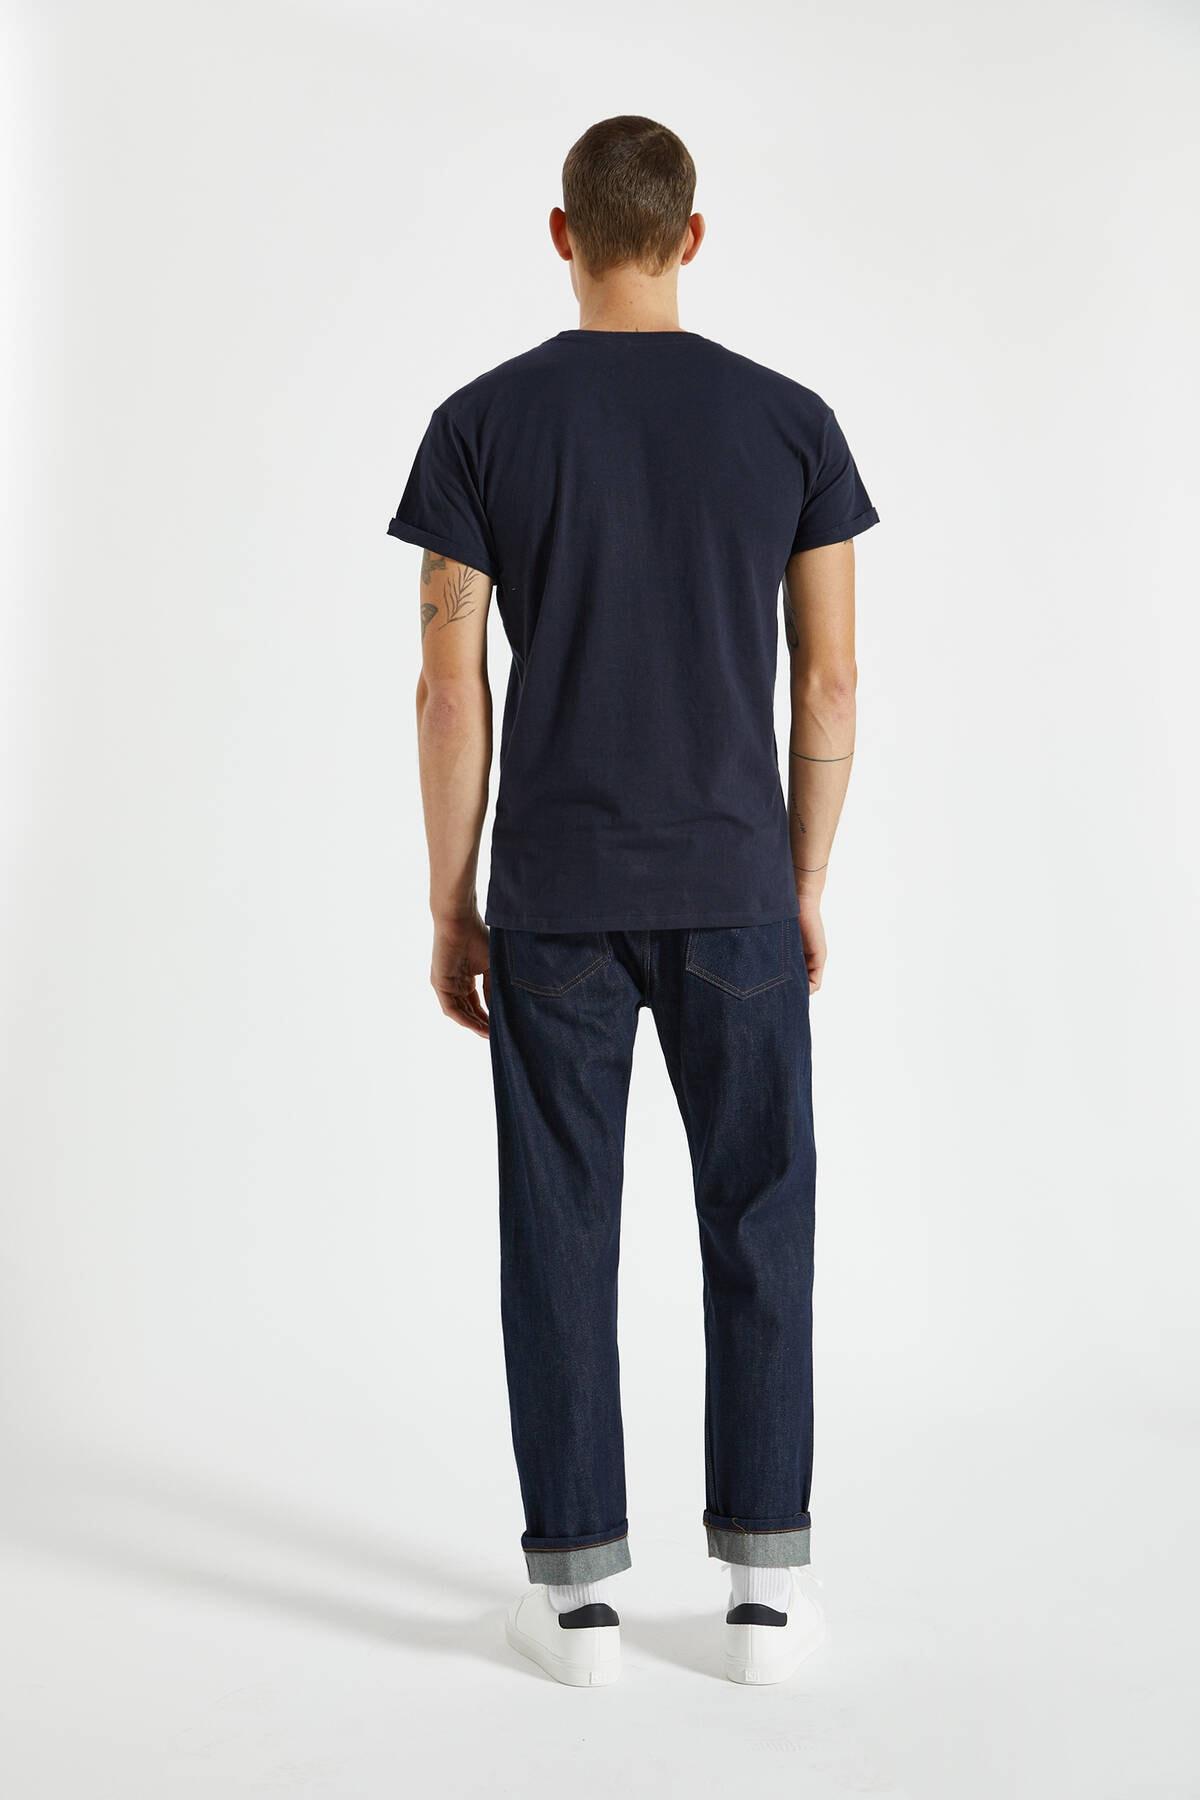 Pull & Bear Erkek Lacivert Logolu Basic Muscle Fit T-Shirt 09244941 2